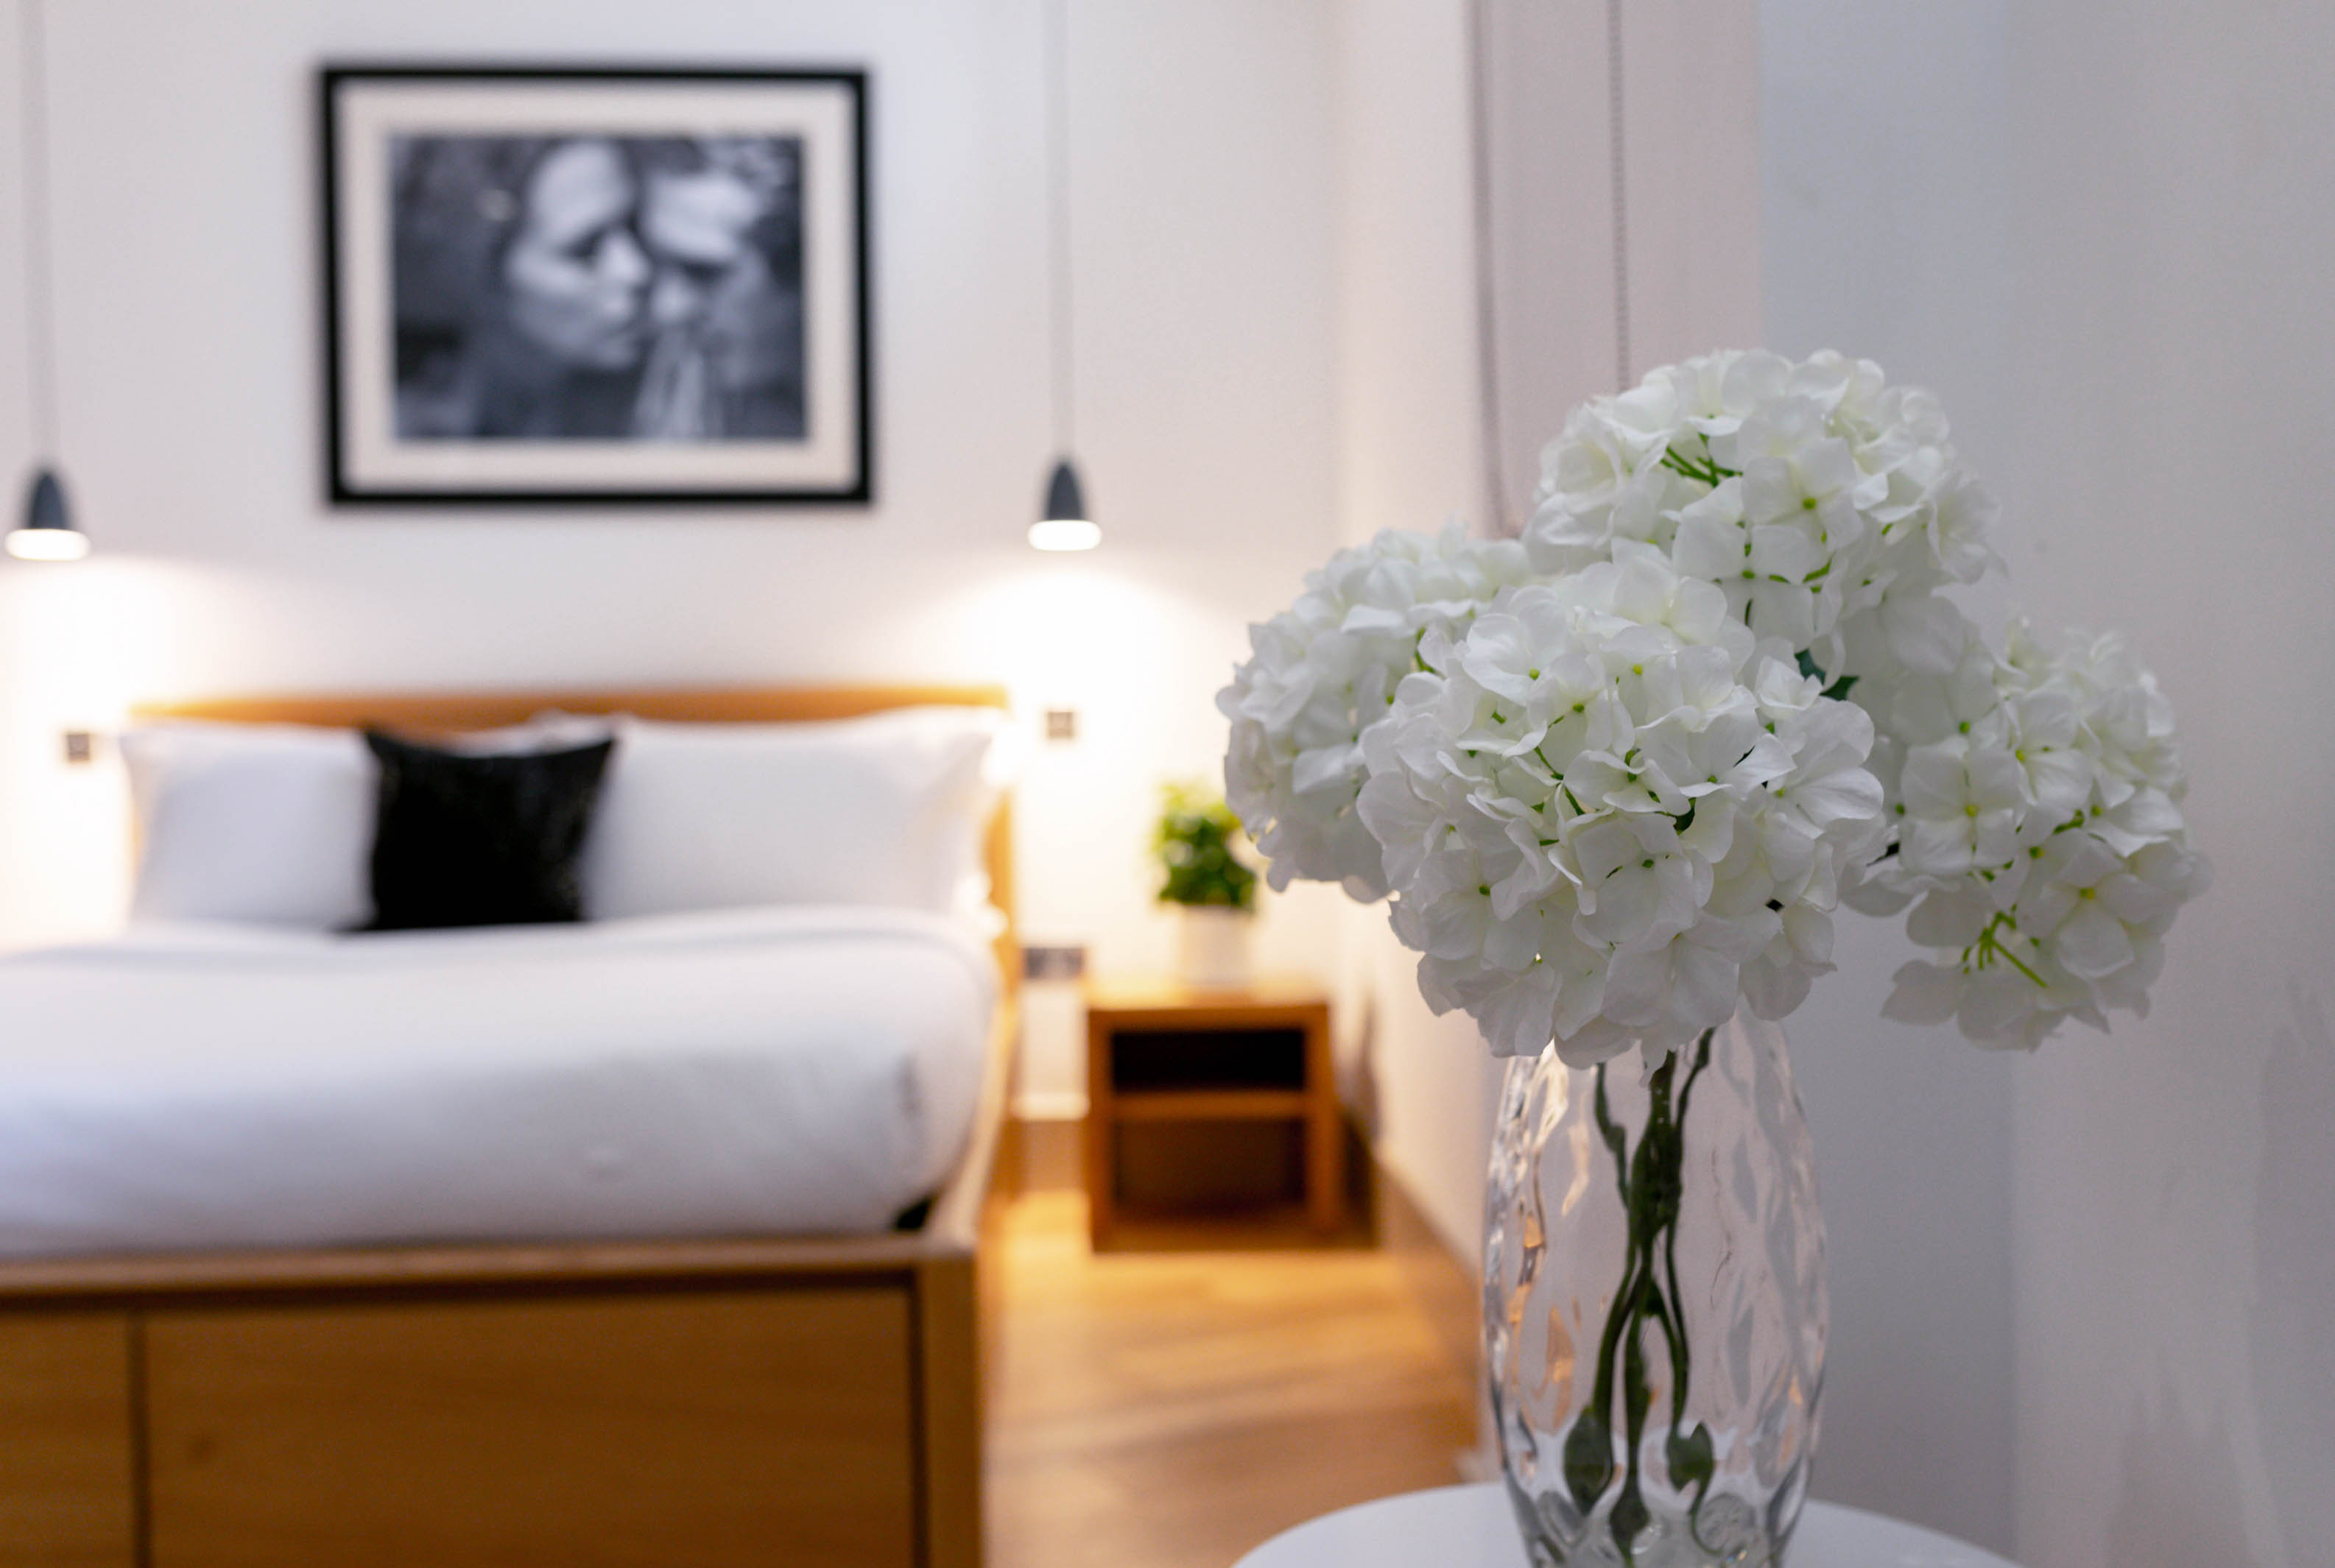 Lovelydays luxury service apartment rental - London - Fitzrovia - Wells Mews B - Lovelysuite - 2 bedrooms - 2 bathrooms - Double bed - 584ff5ad11ad - Lovelydays